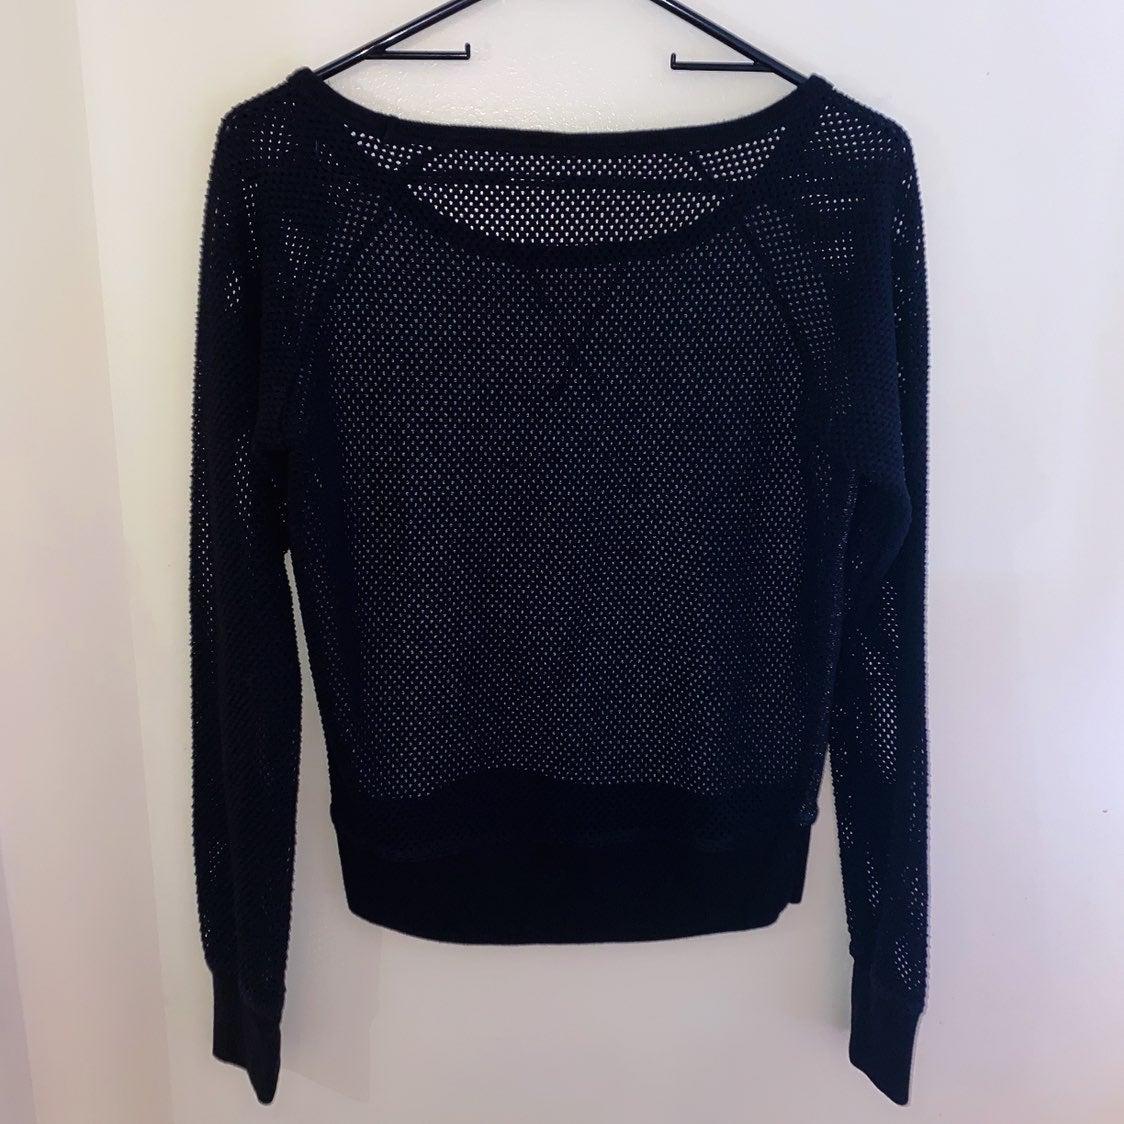 Lorna Jane black mesh sweatshirt